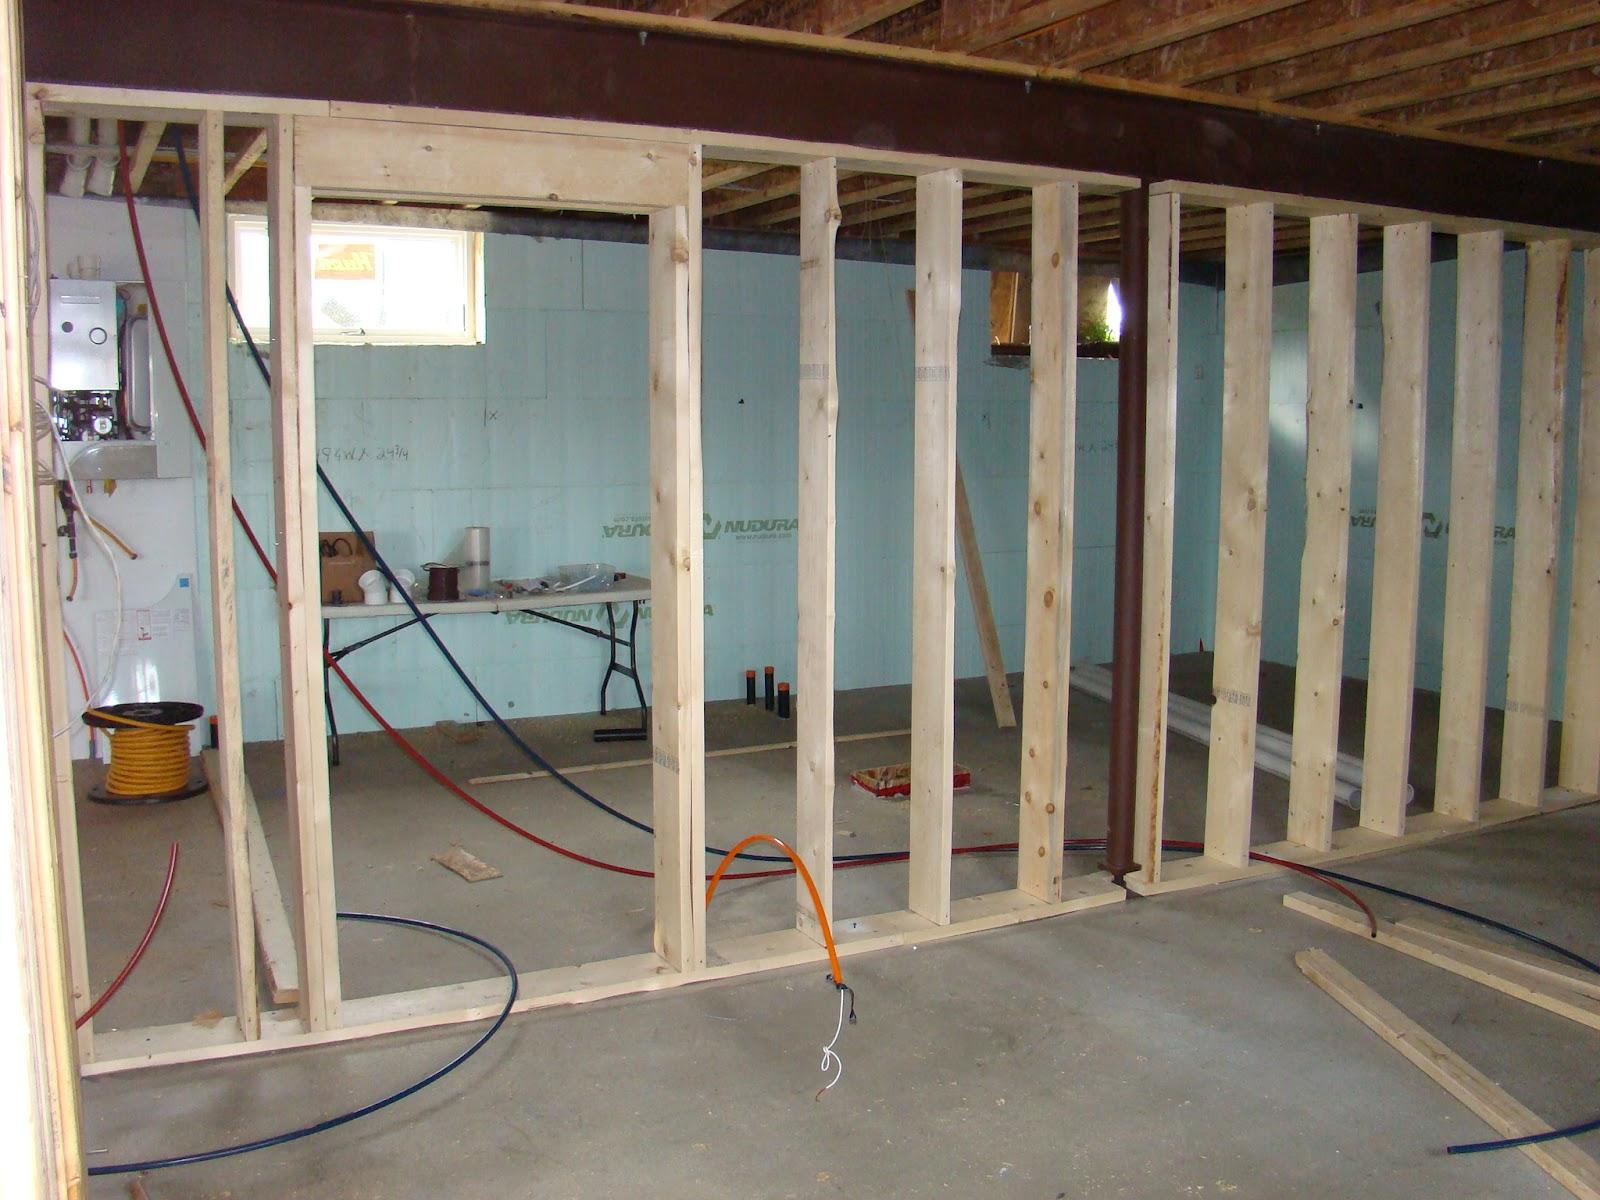 Building Walls In A Basement Urban Home Interior Wiring From Previous Rough Wall Framing Natashamillerweb Rh Com Stud